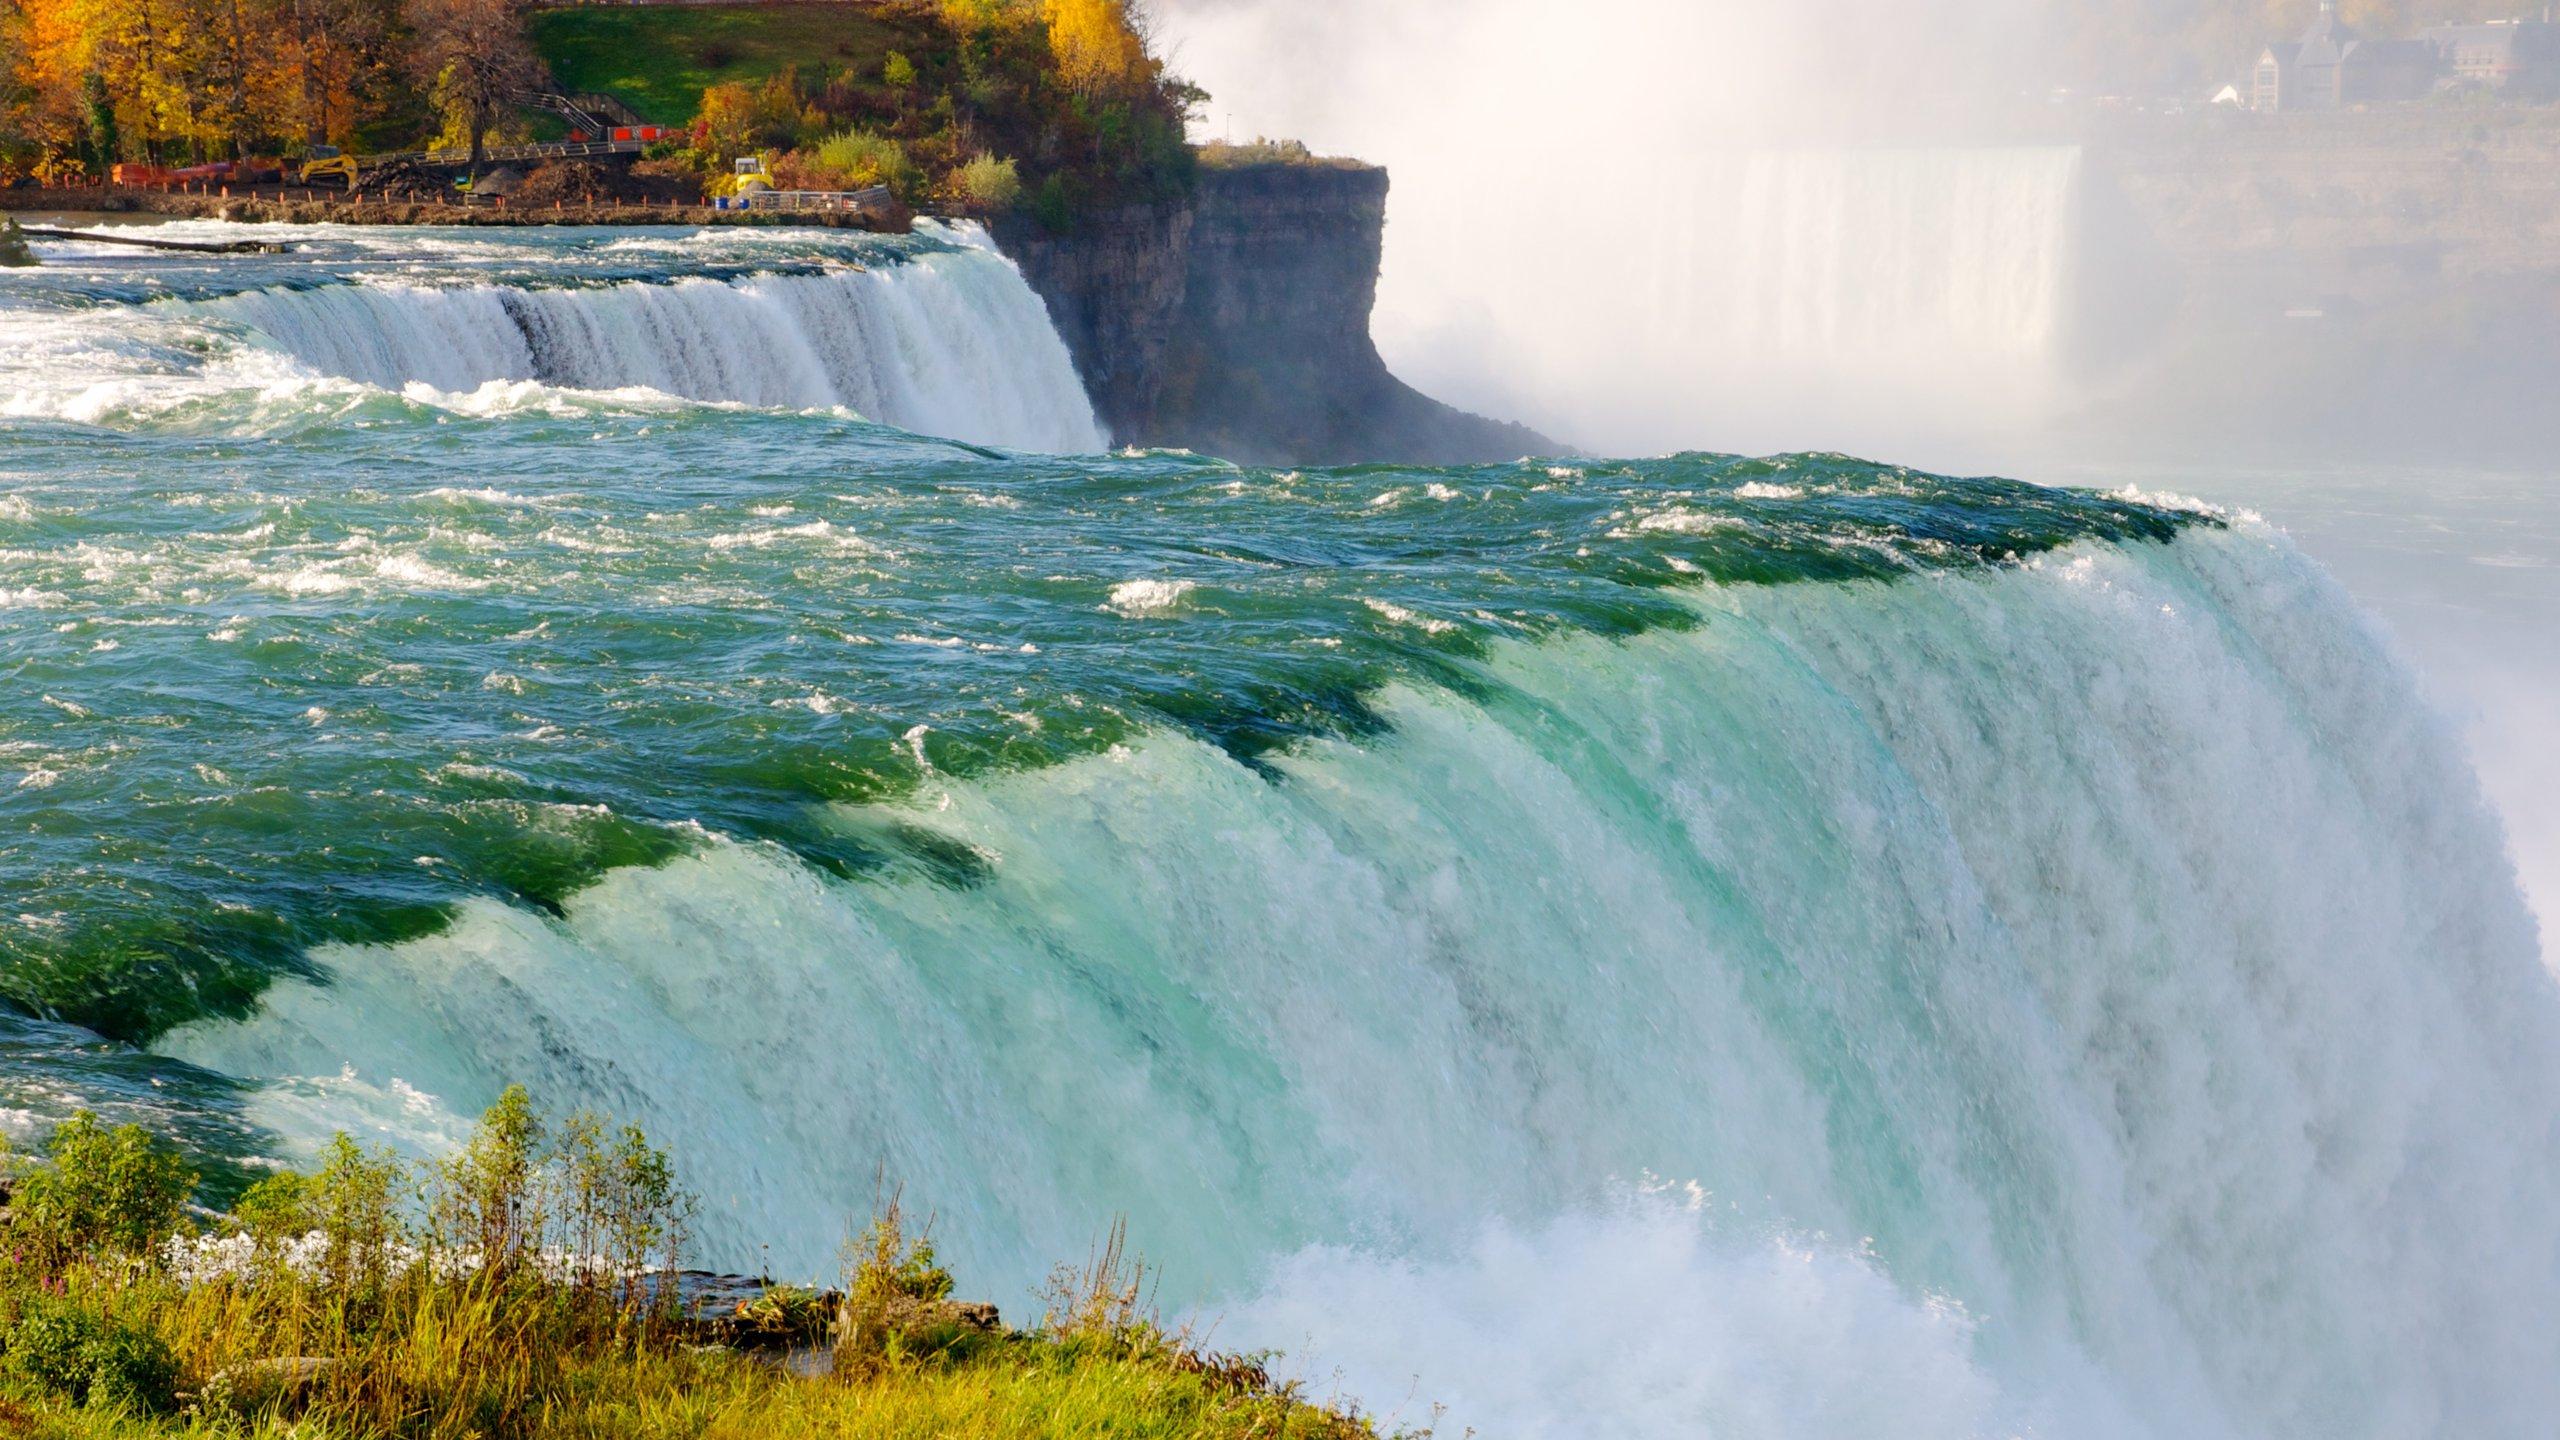 Downtown Niagara Falls, Niagara Falls, New York, United States of America